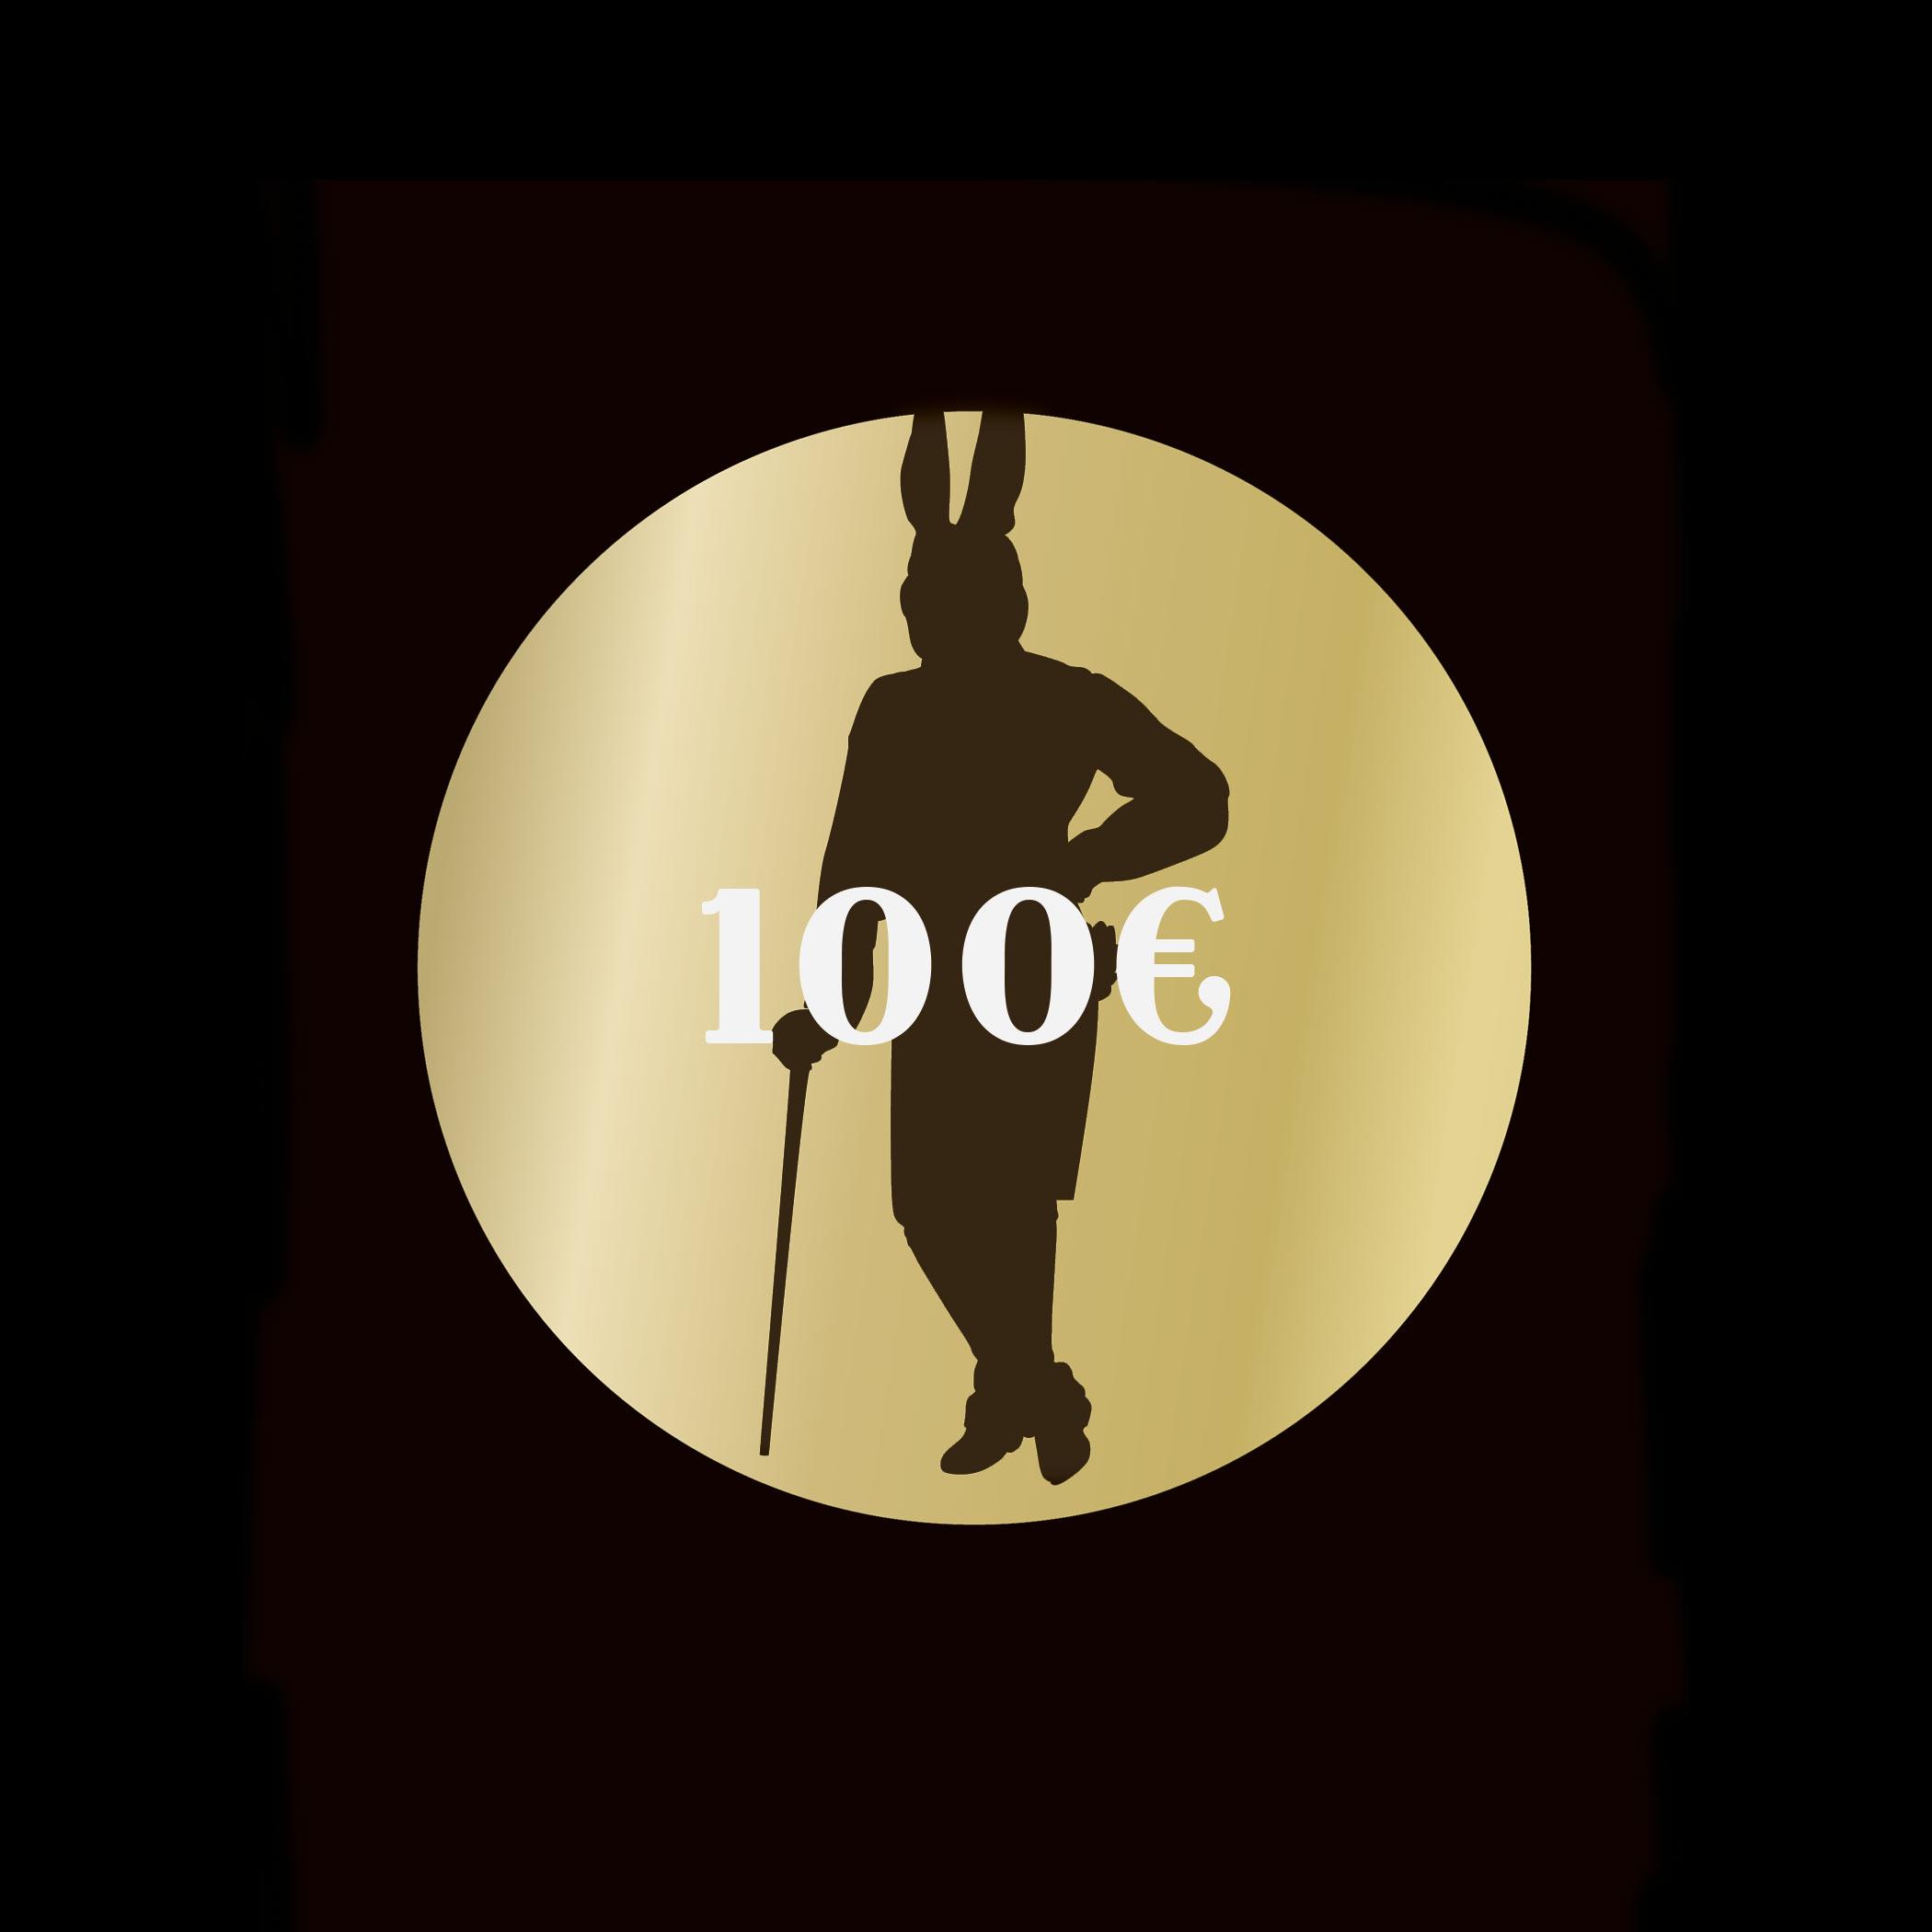 100 Euro Gutschein The Rabbithole Bar